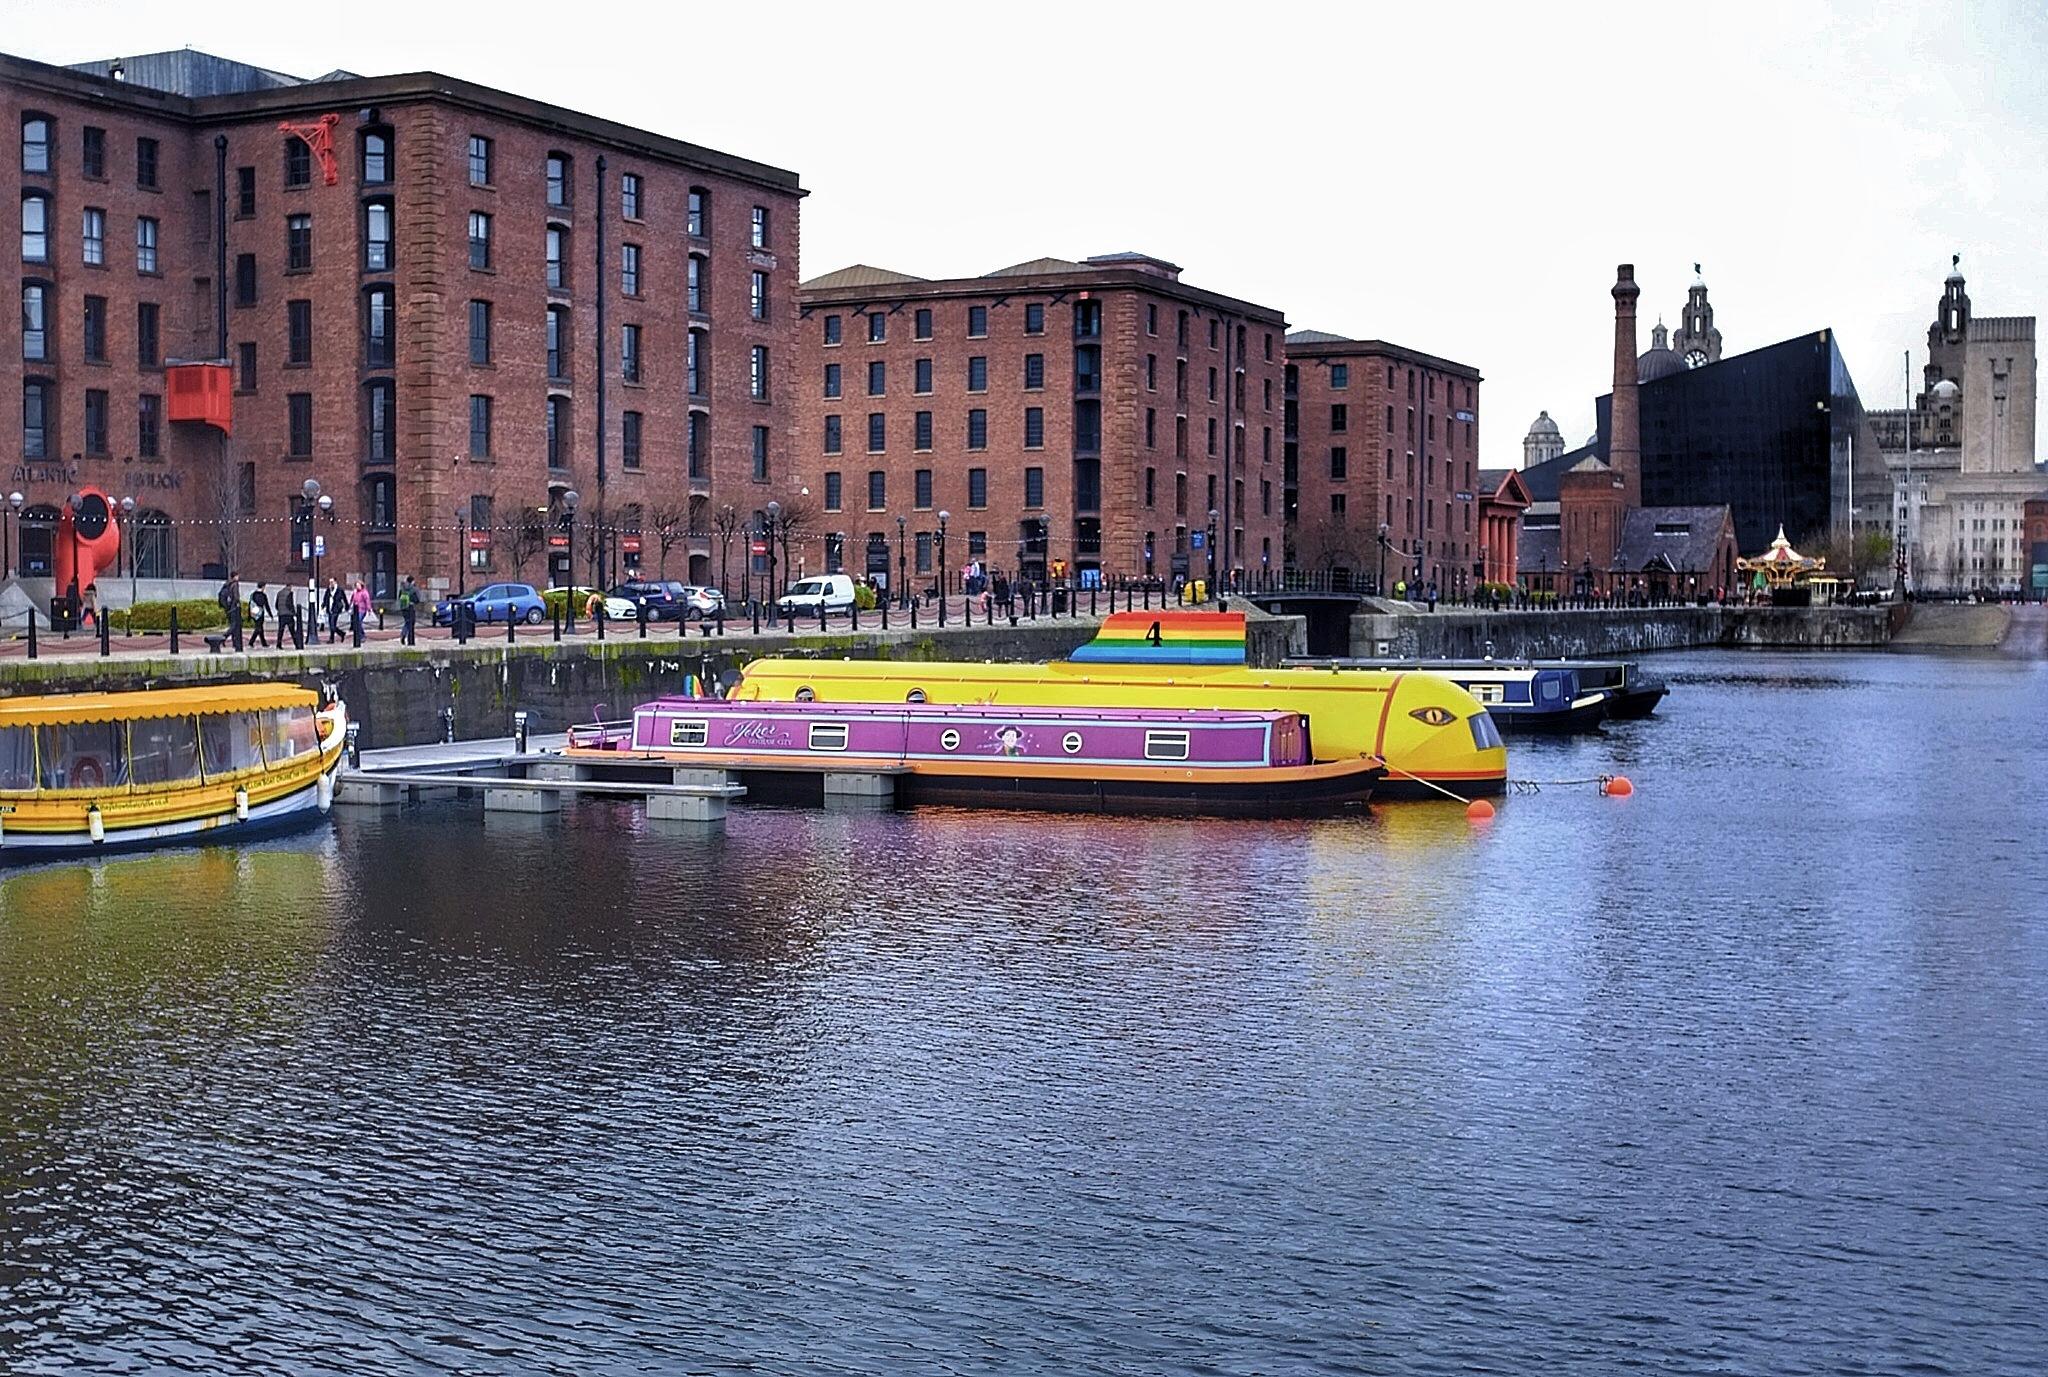 Liverpool Albert Dock uk...23062208 by Michael jjg